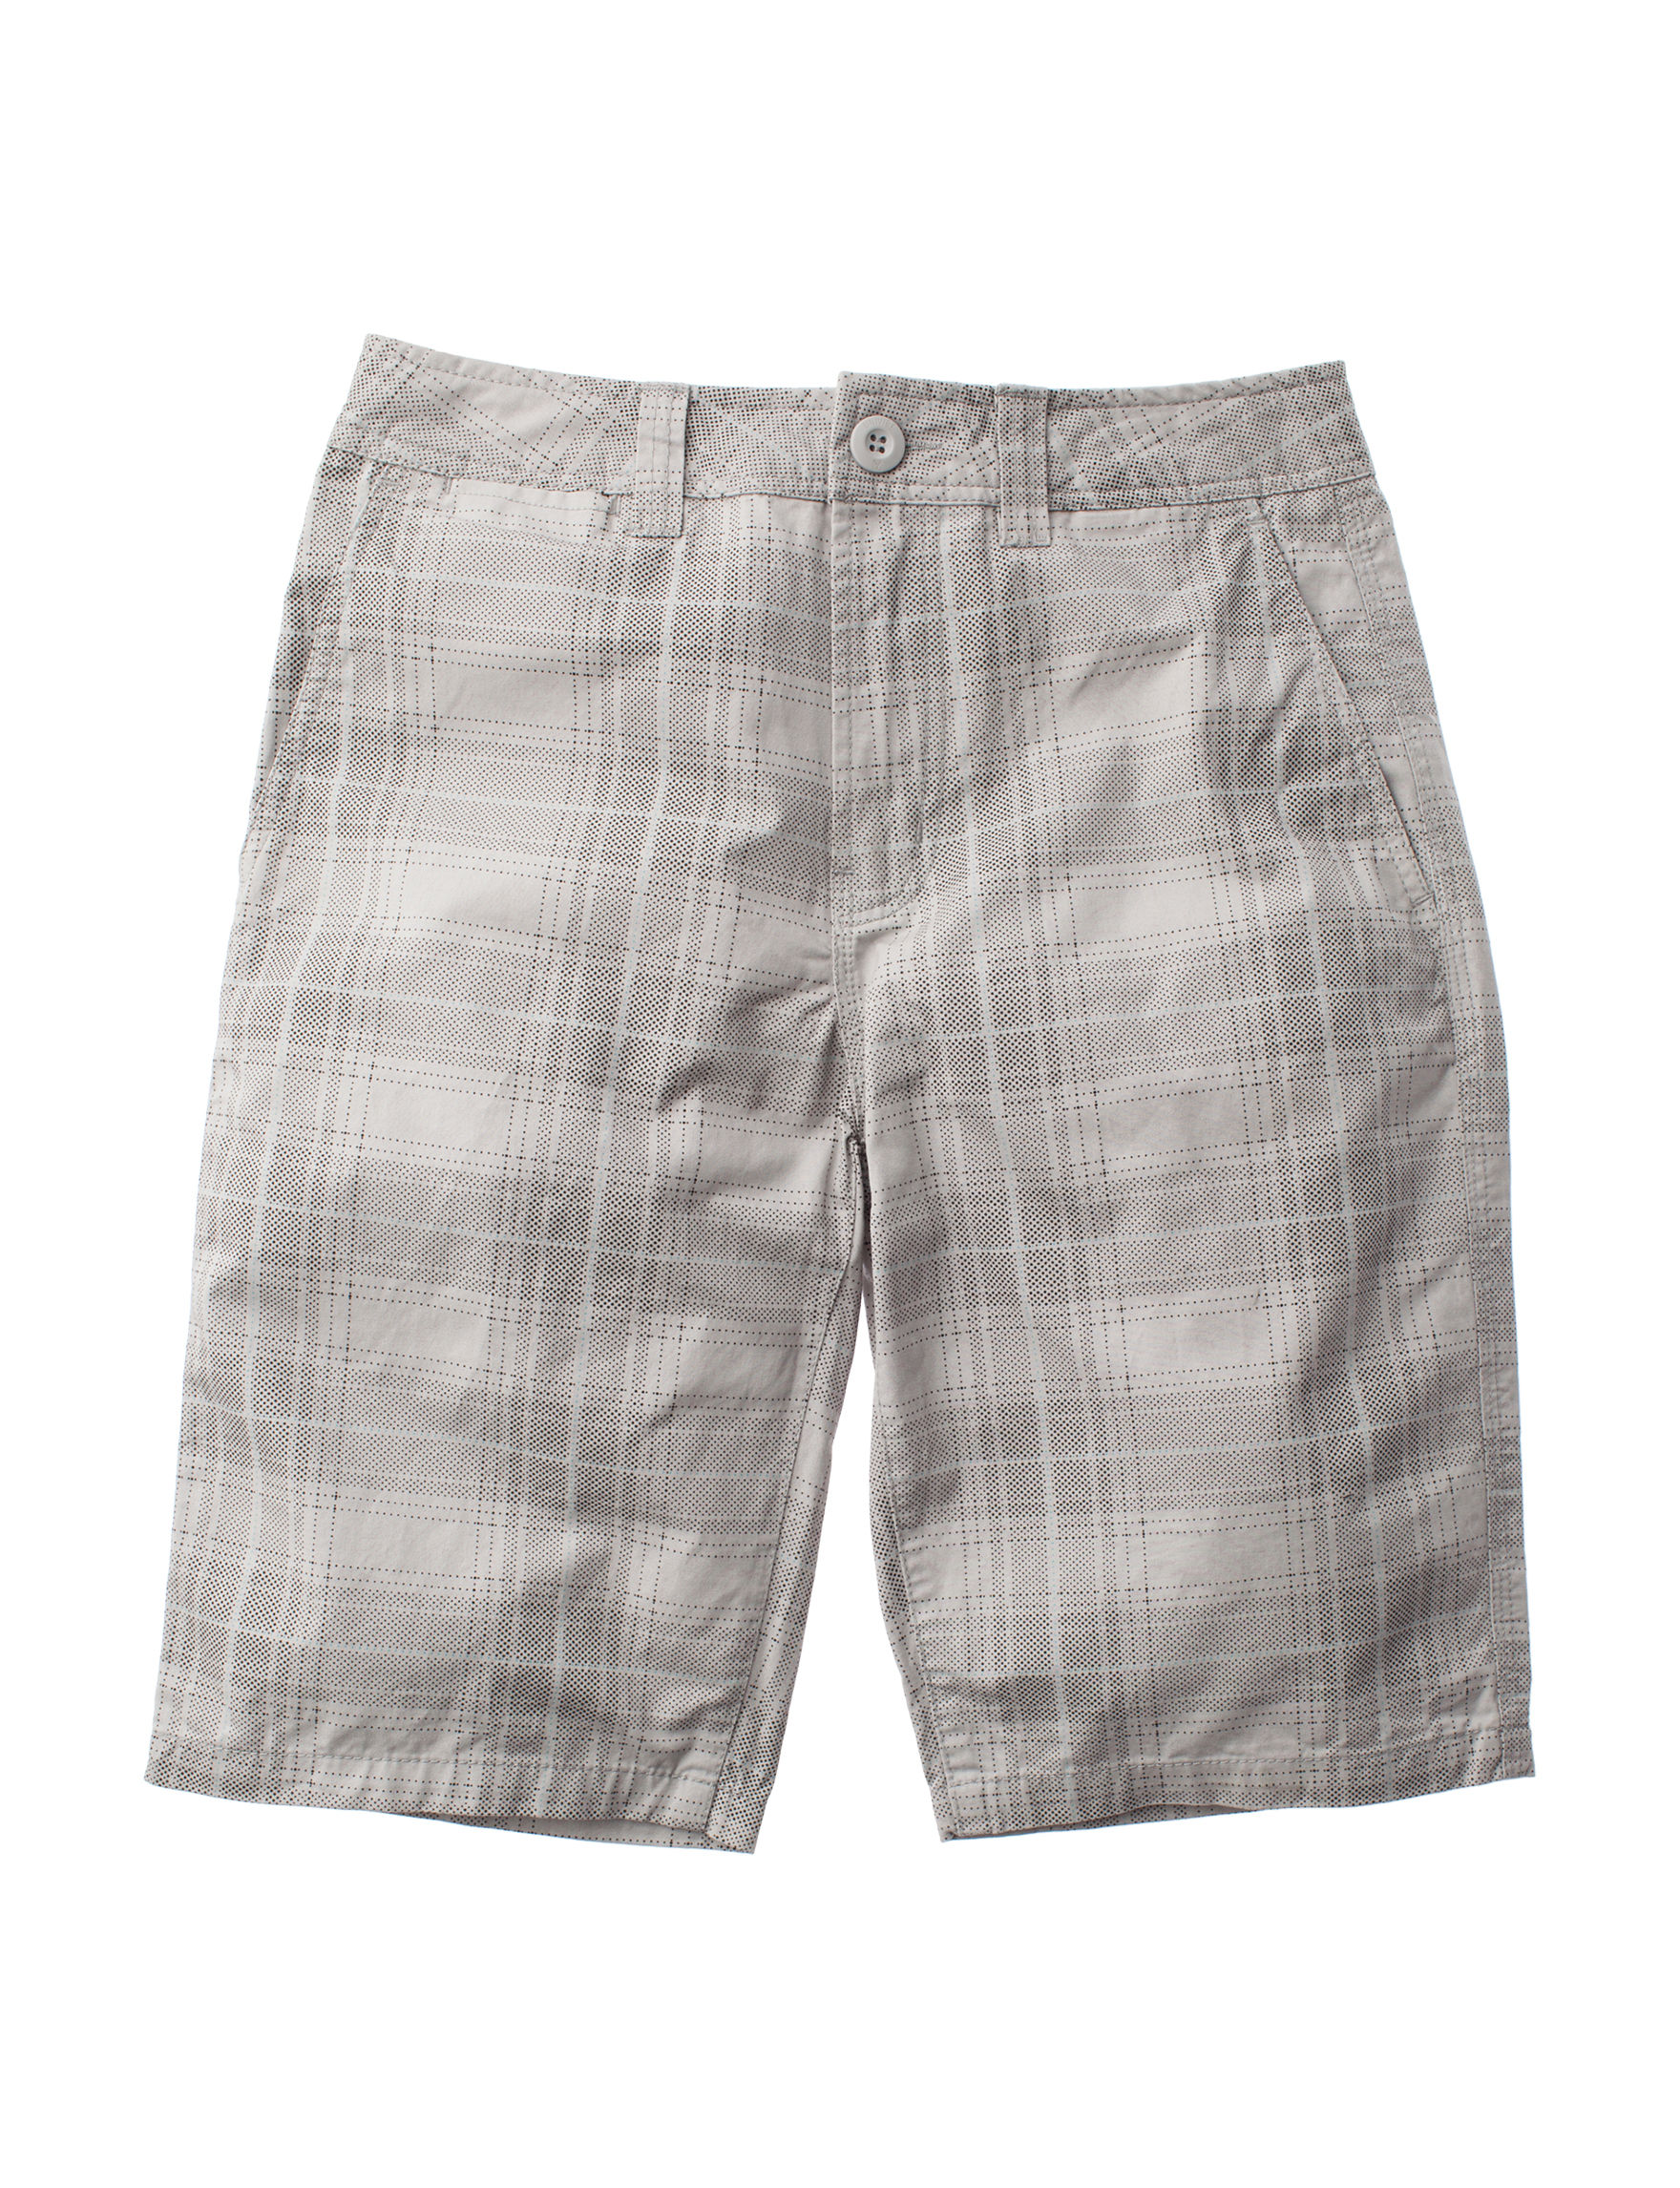 Rustic Blue Grey Plaid Soft Shorts